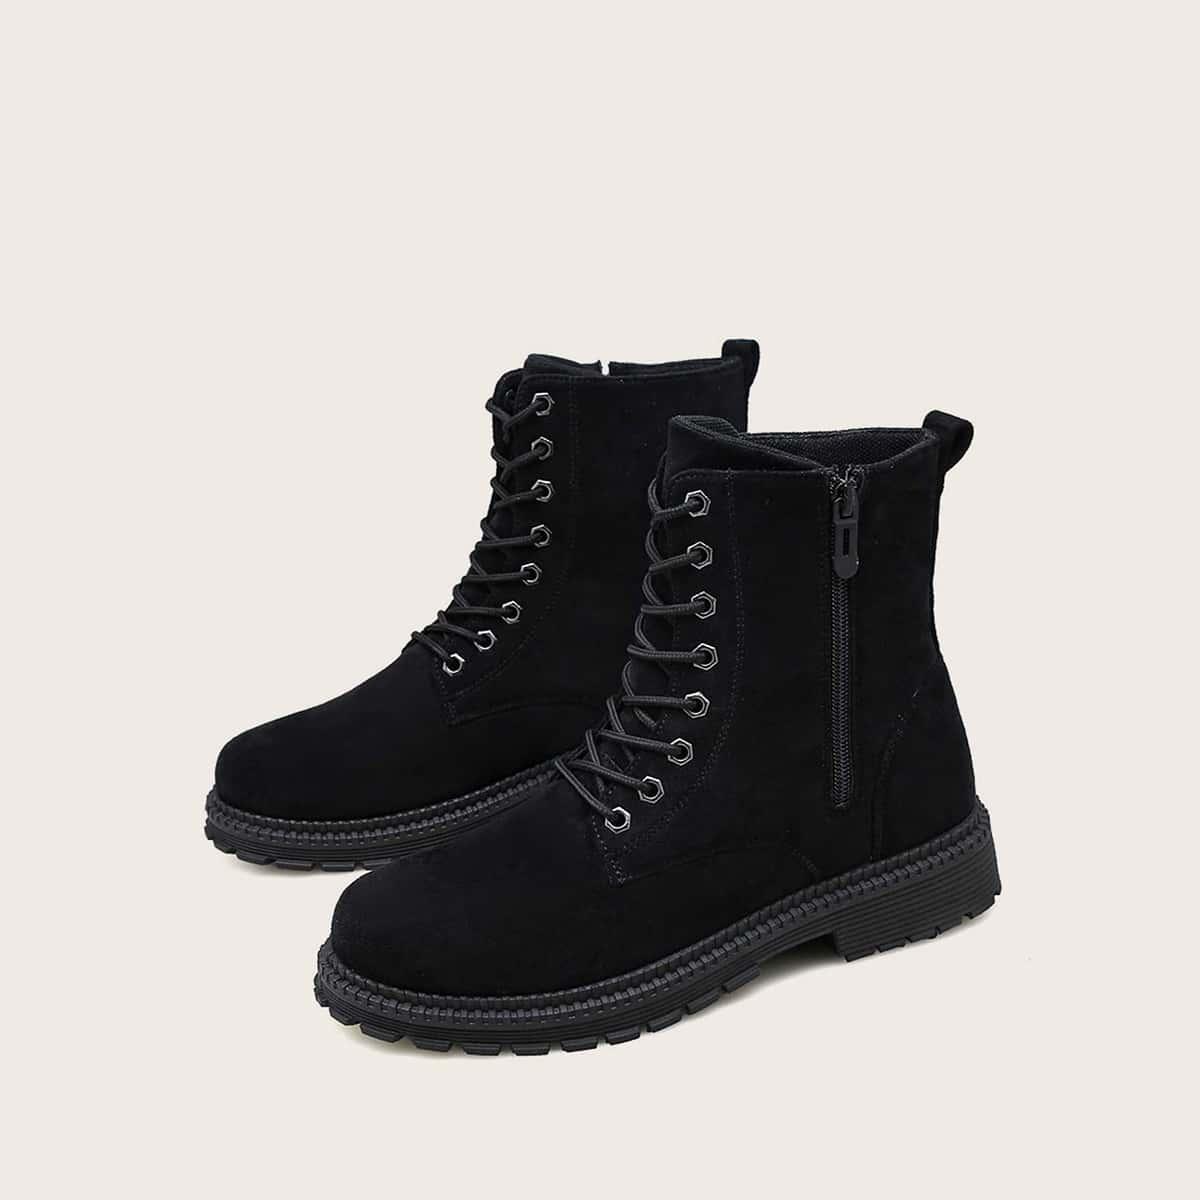 SHEIN / Men Lace-up Front Suede Combat Boots